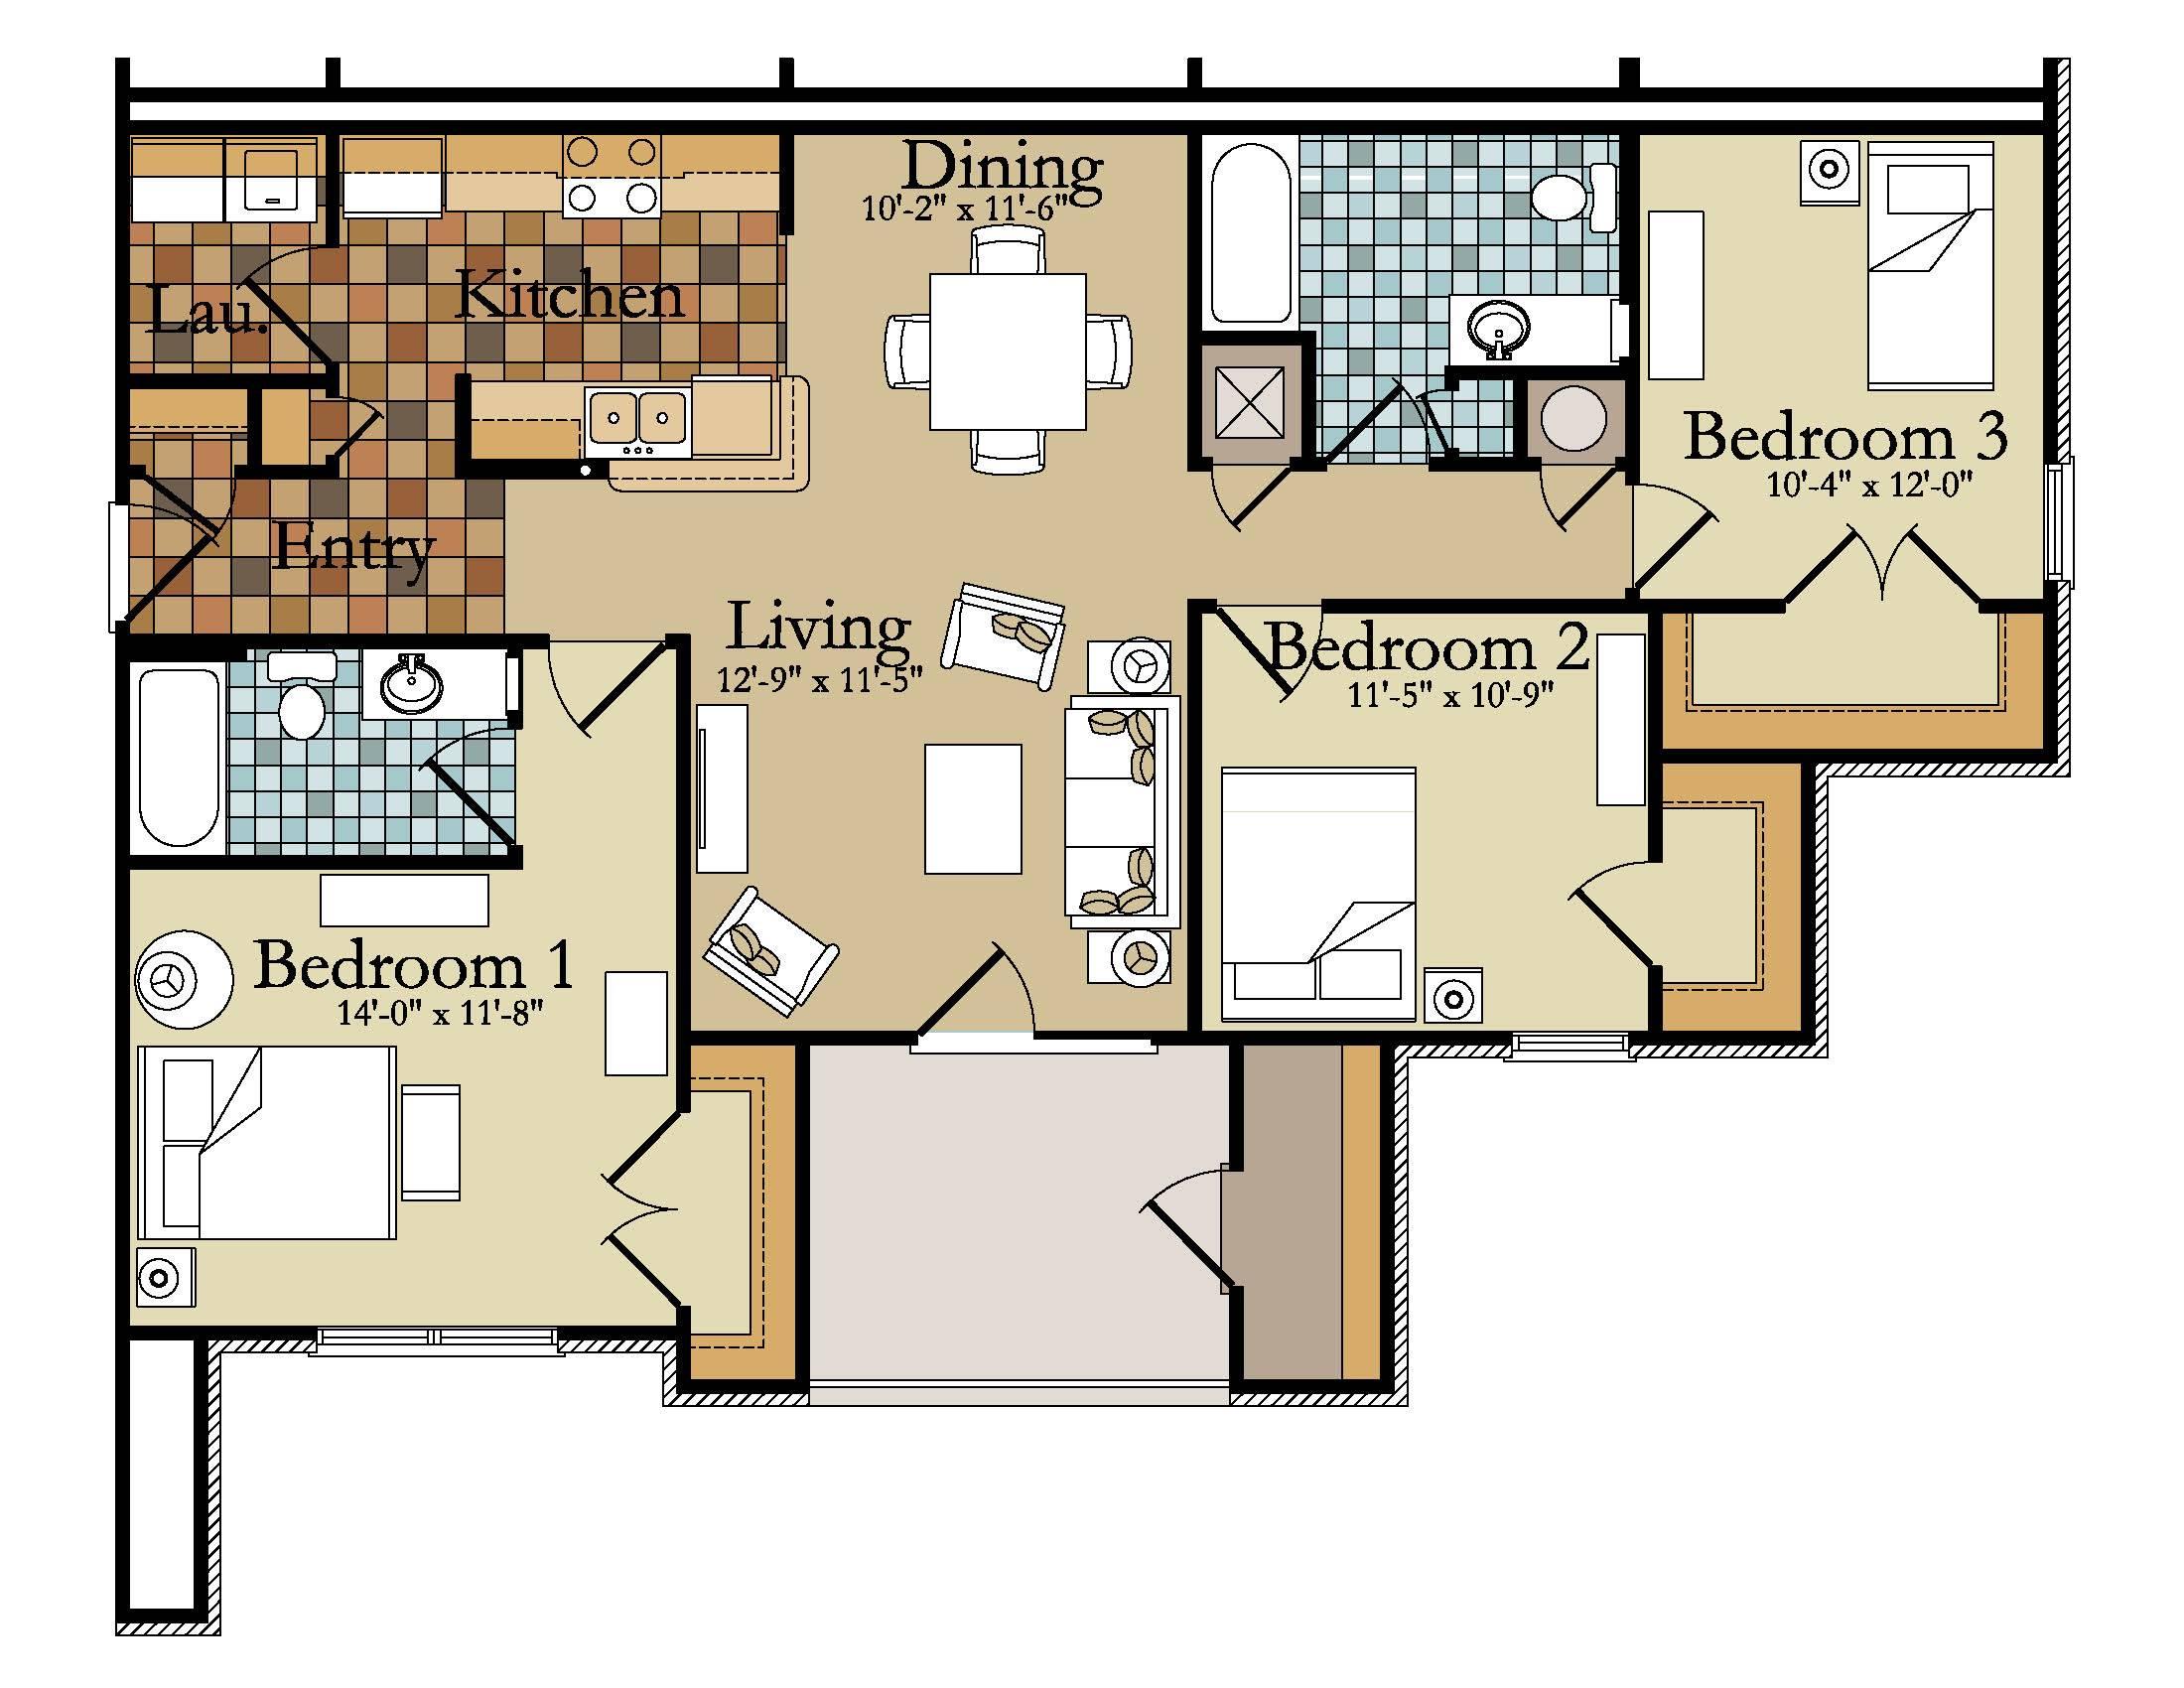 Bedroom Flats Floor Plans Home Deco House Plans 98688